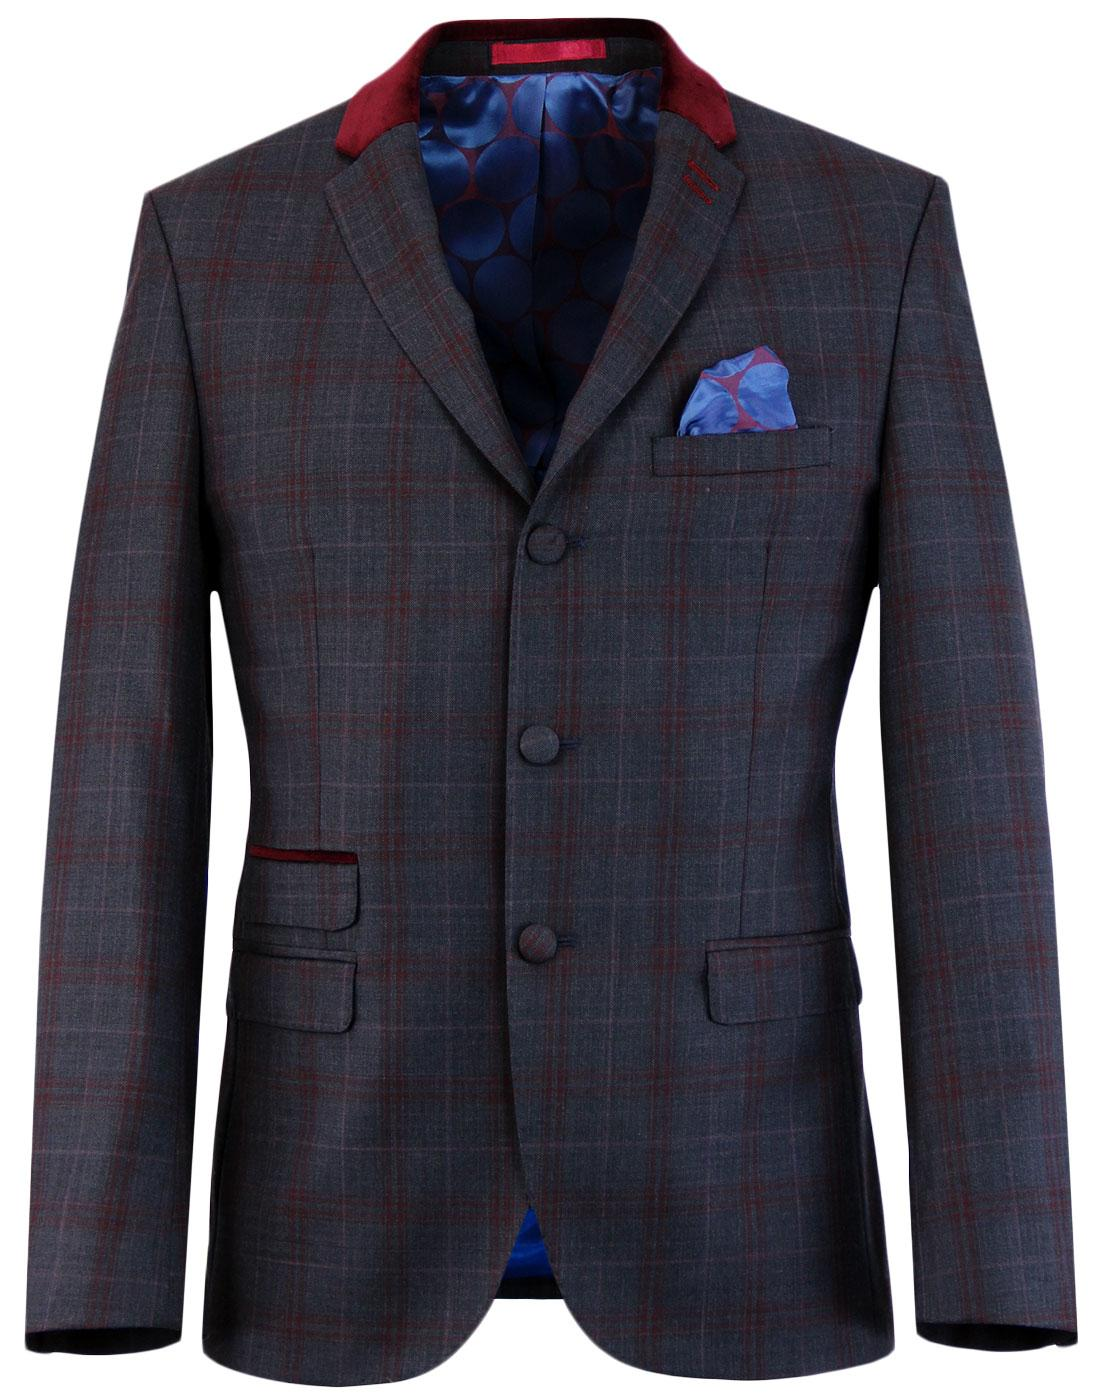 MADCAP ENGLAND Mod Velvet Collar Check Suit Jacket